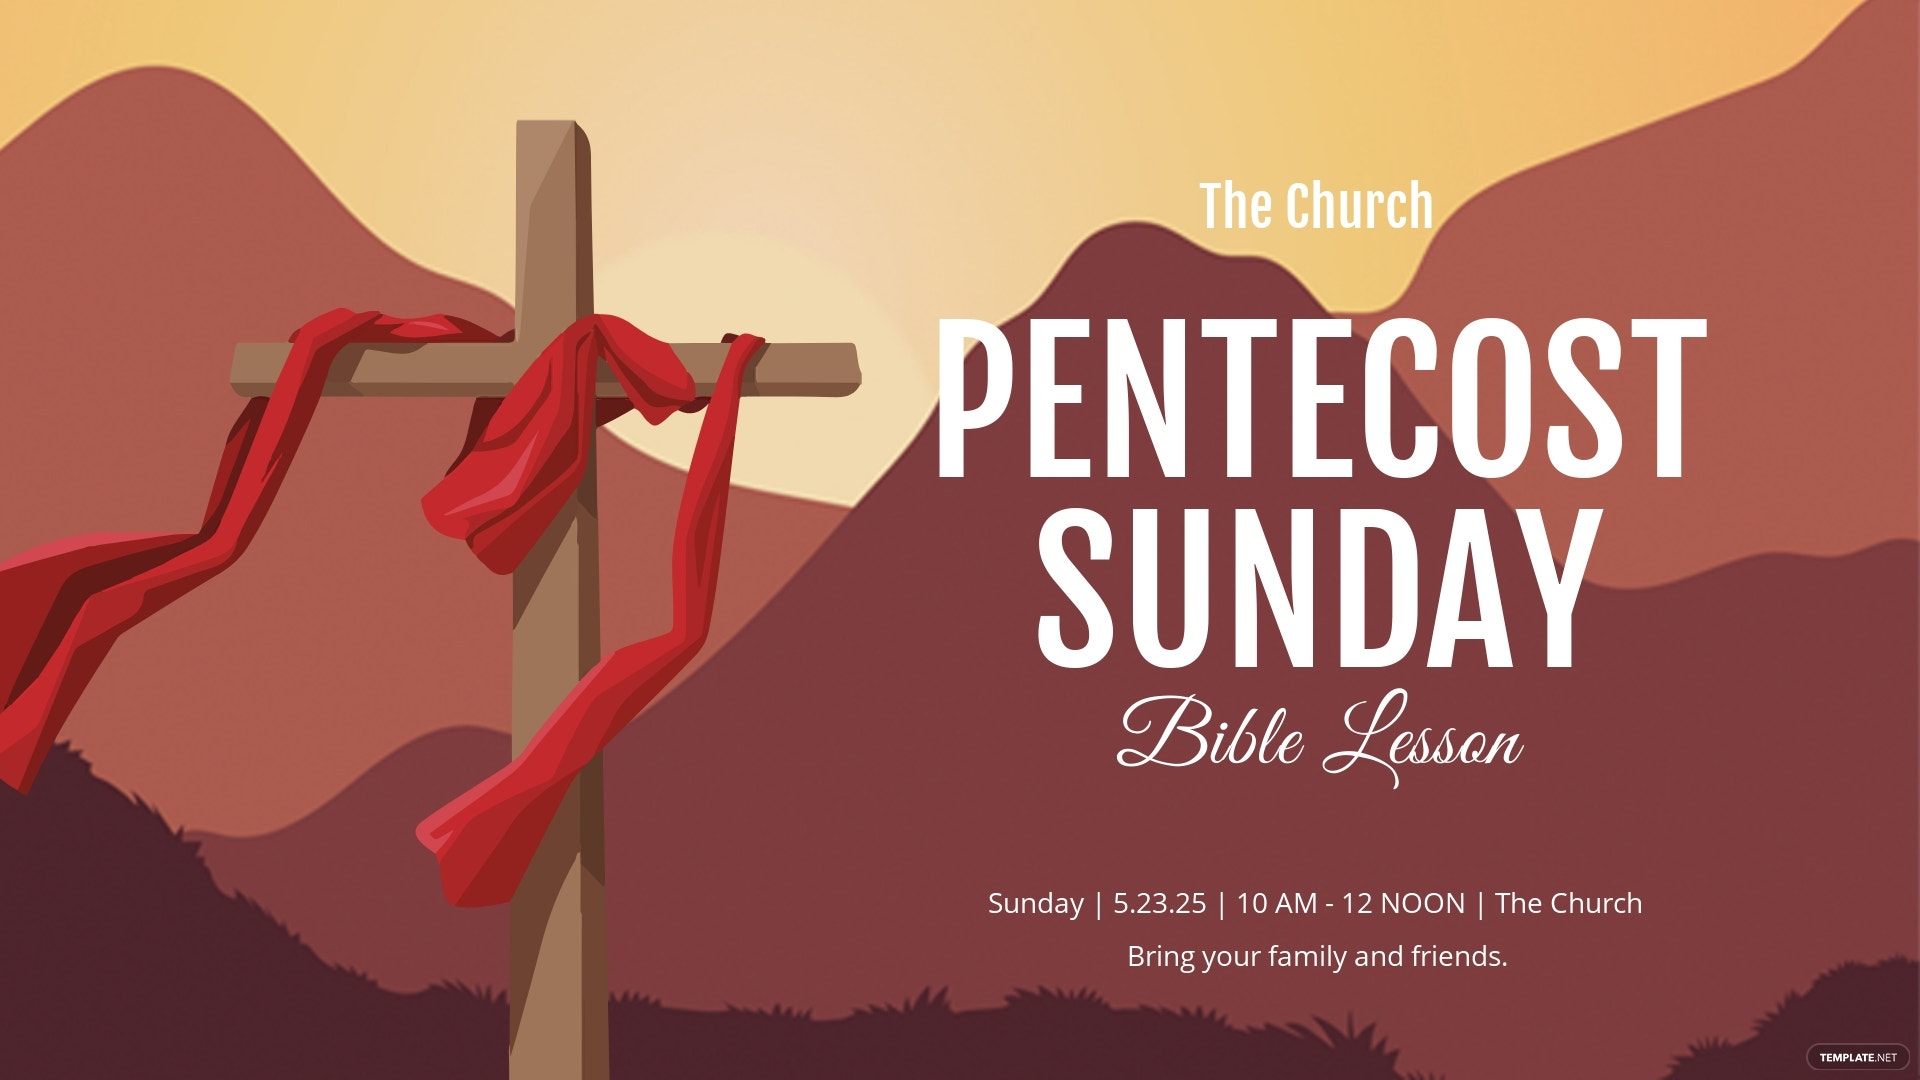 Pentecost Sunday Facebook Event Cover Template